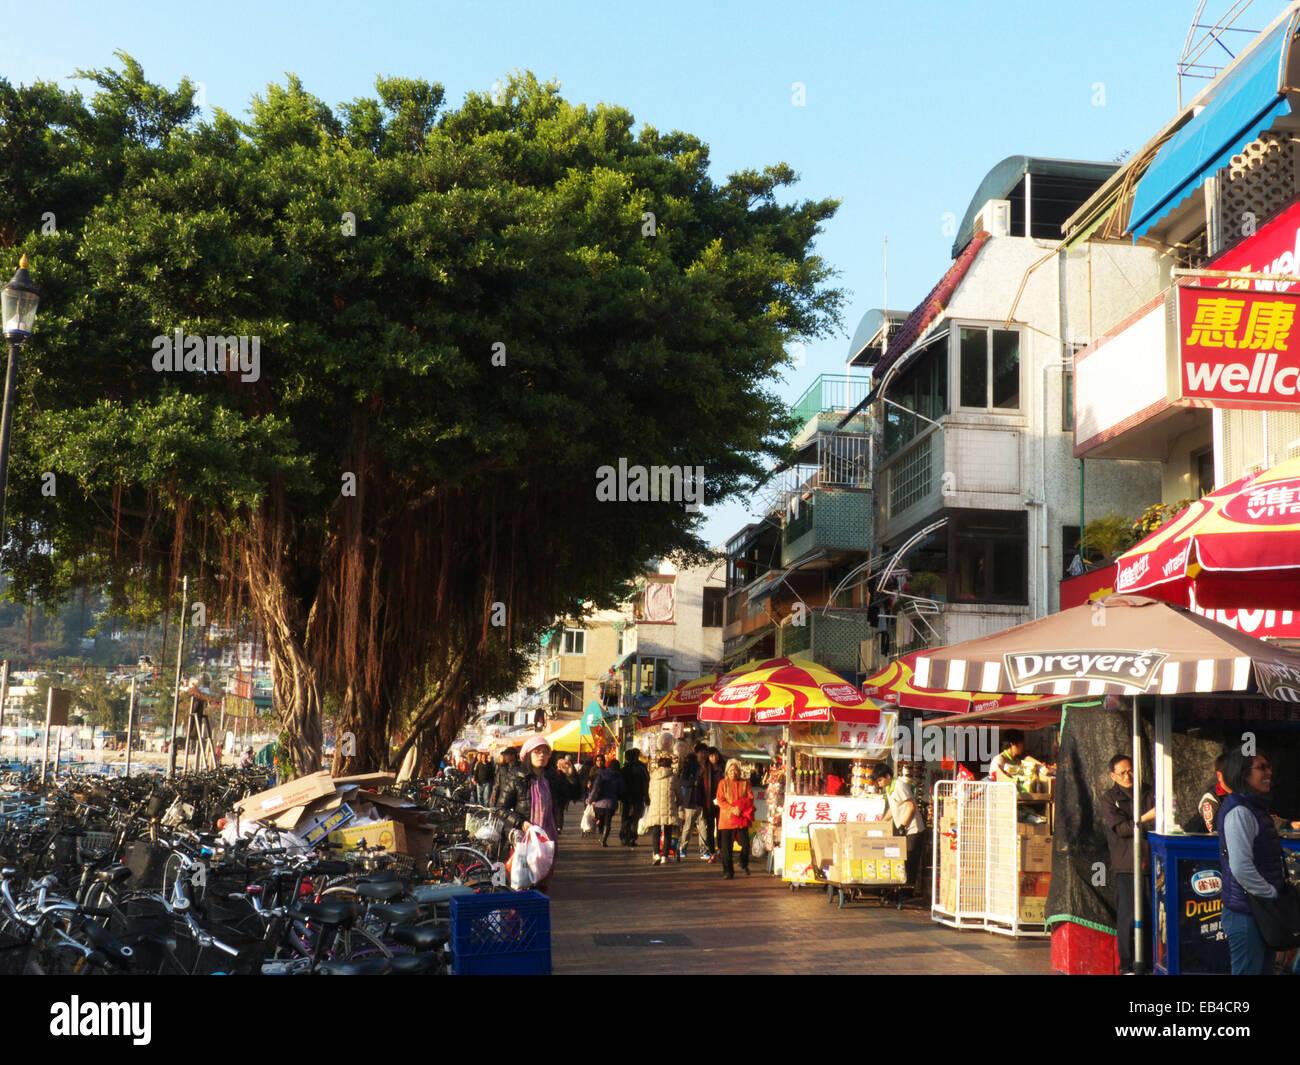 China Hong Kong Cheung Chau Waterfront promenade street scene. - Stock Image